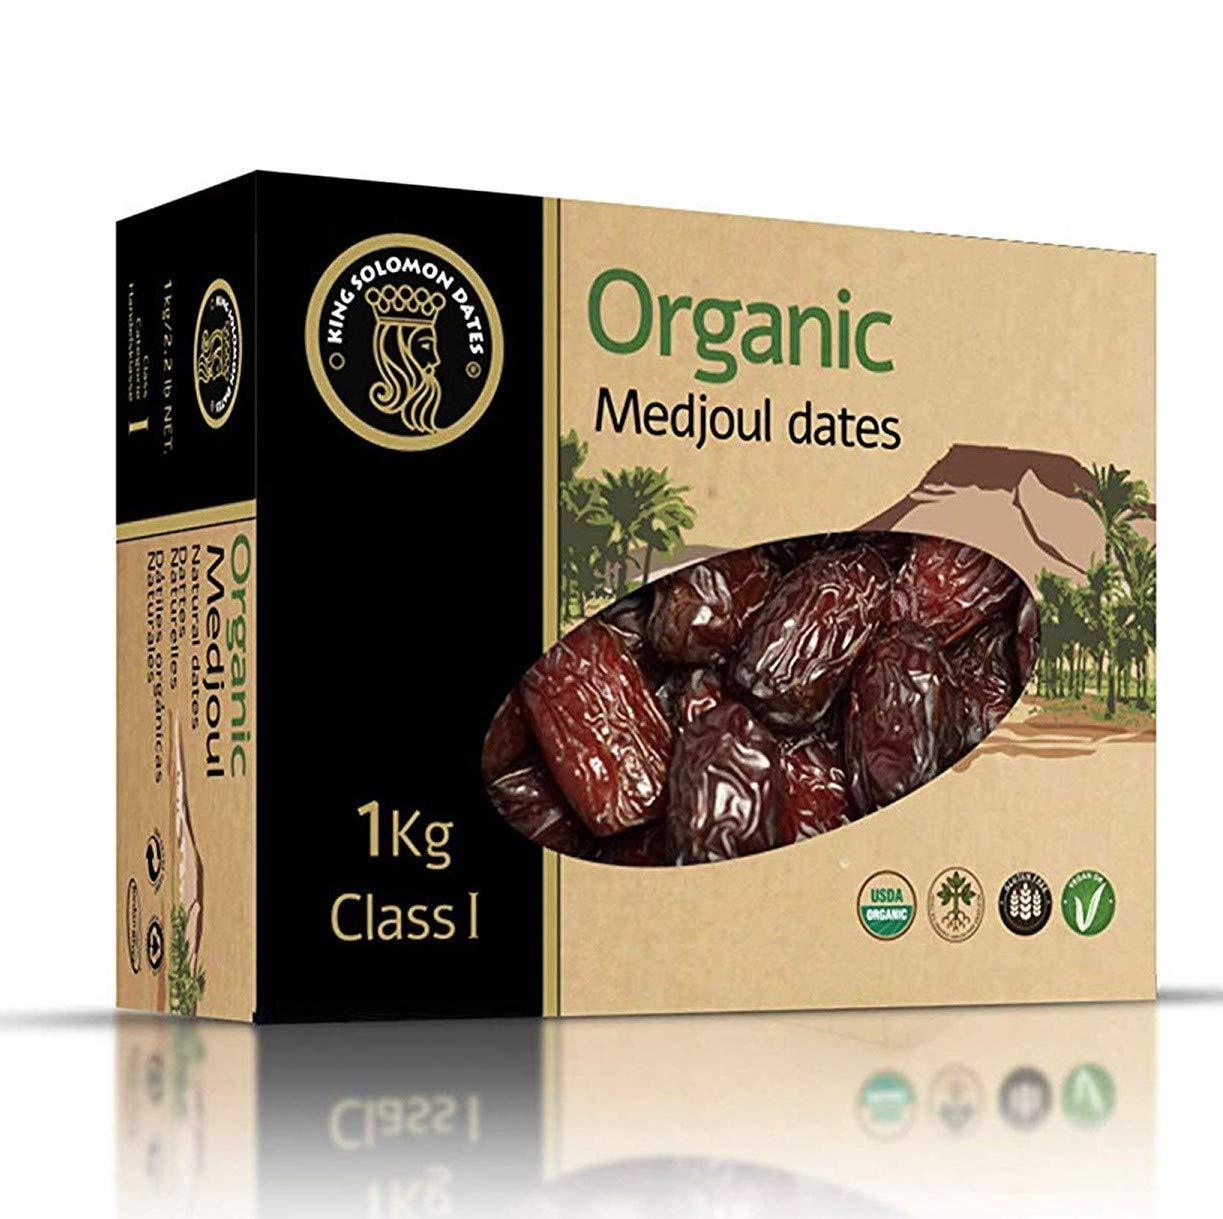 King Solomon 100% Organic Premium Medjoul (Medjool) Dates, 2.2lbs